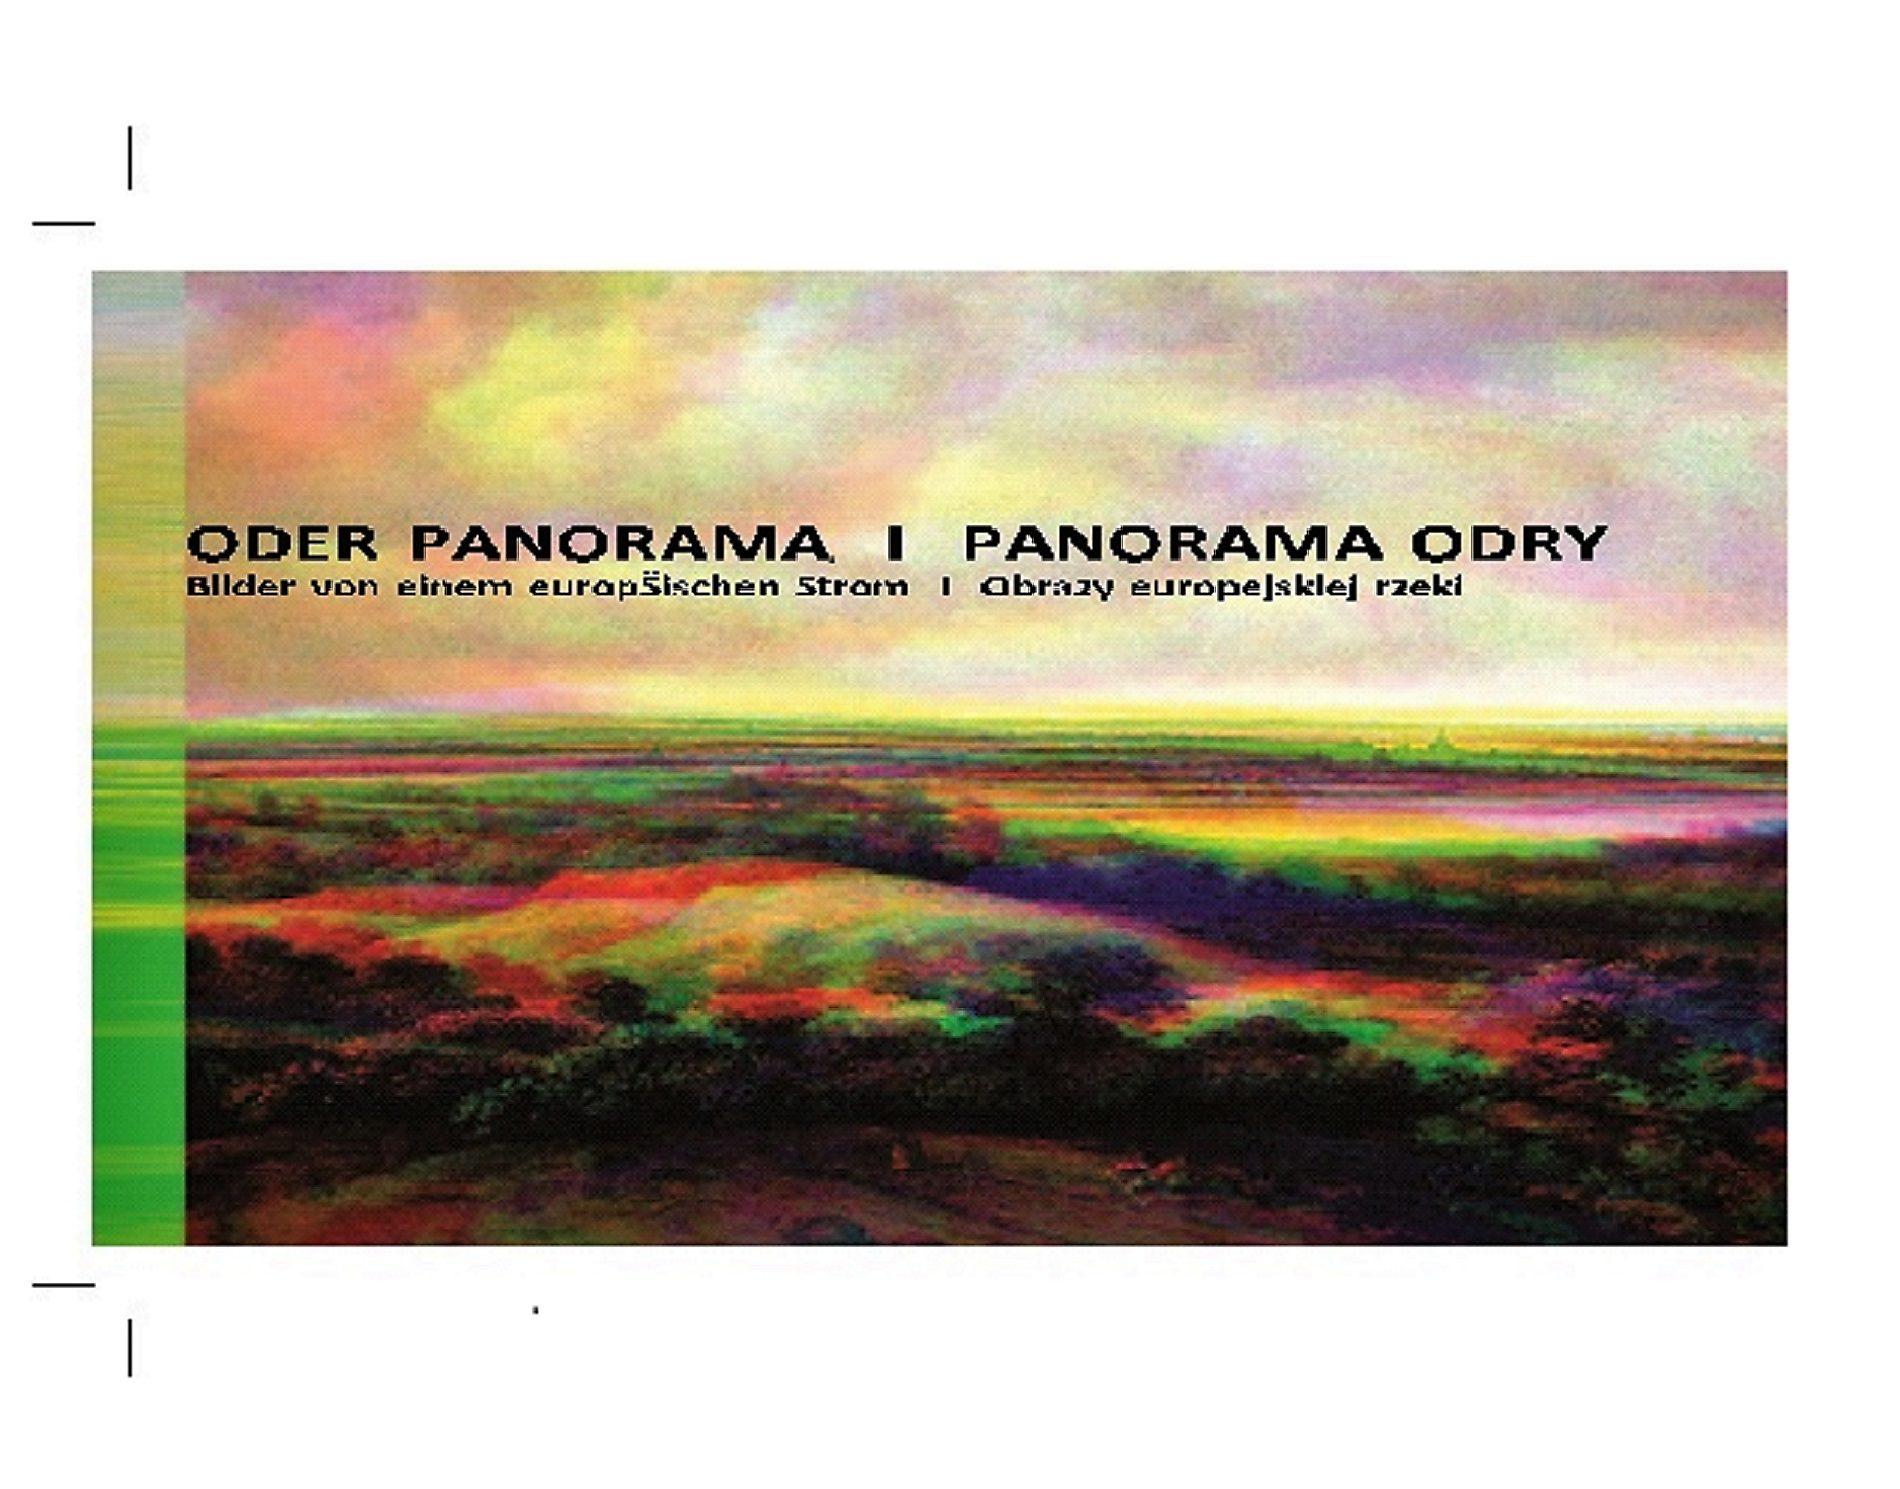 Wystawa <br/>Oder-Panorama I Panorama Odry